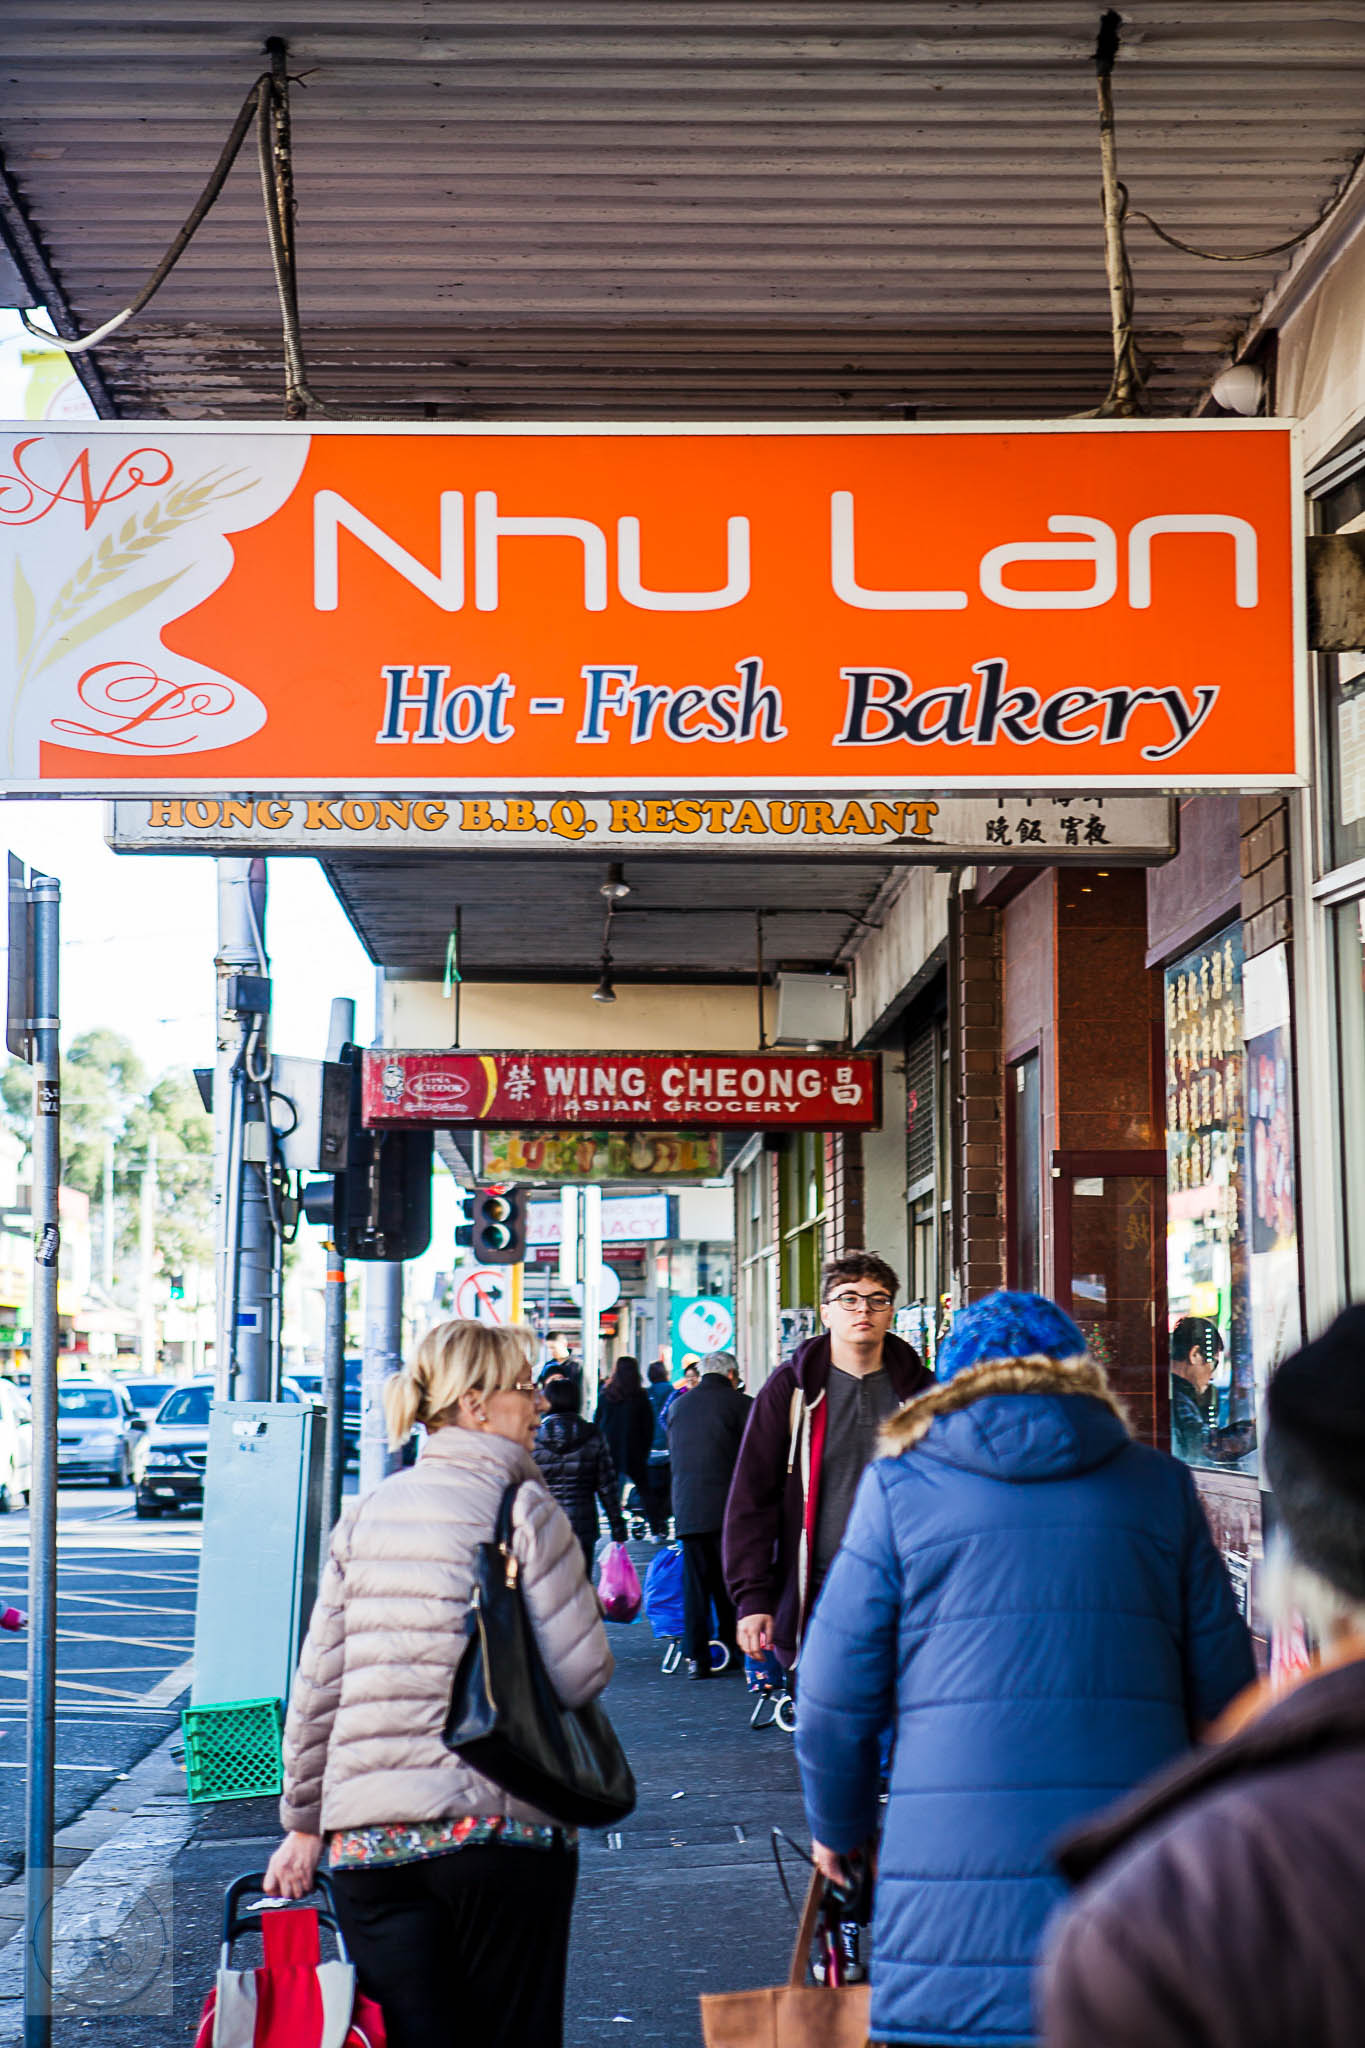 Nhu Lan Mamma Knows West (1 of 10).jpg